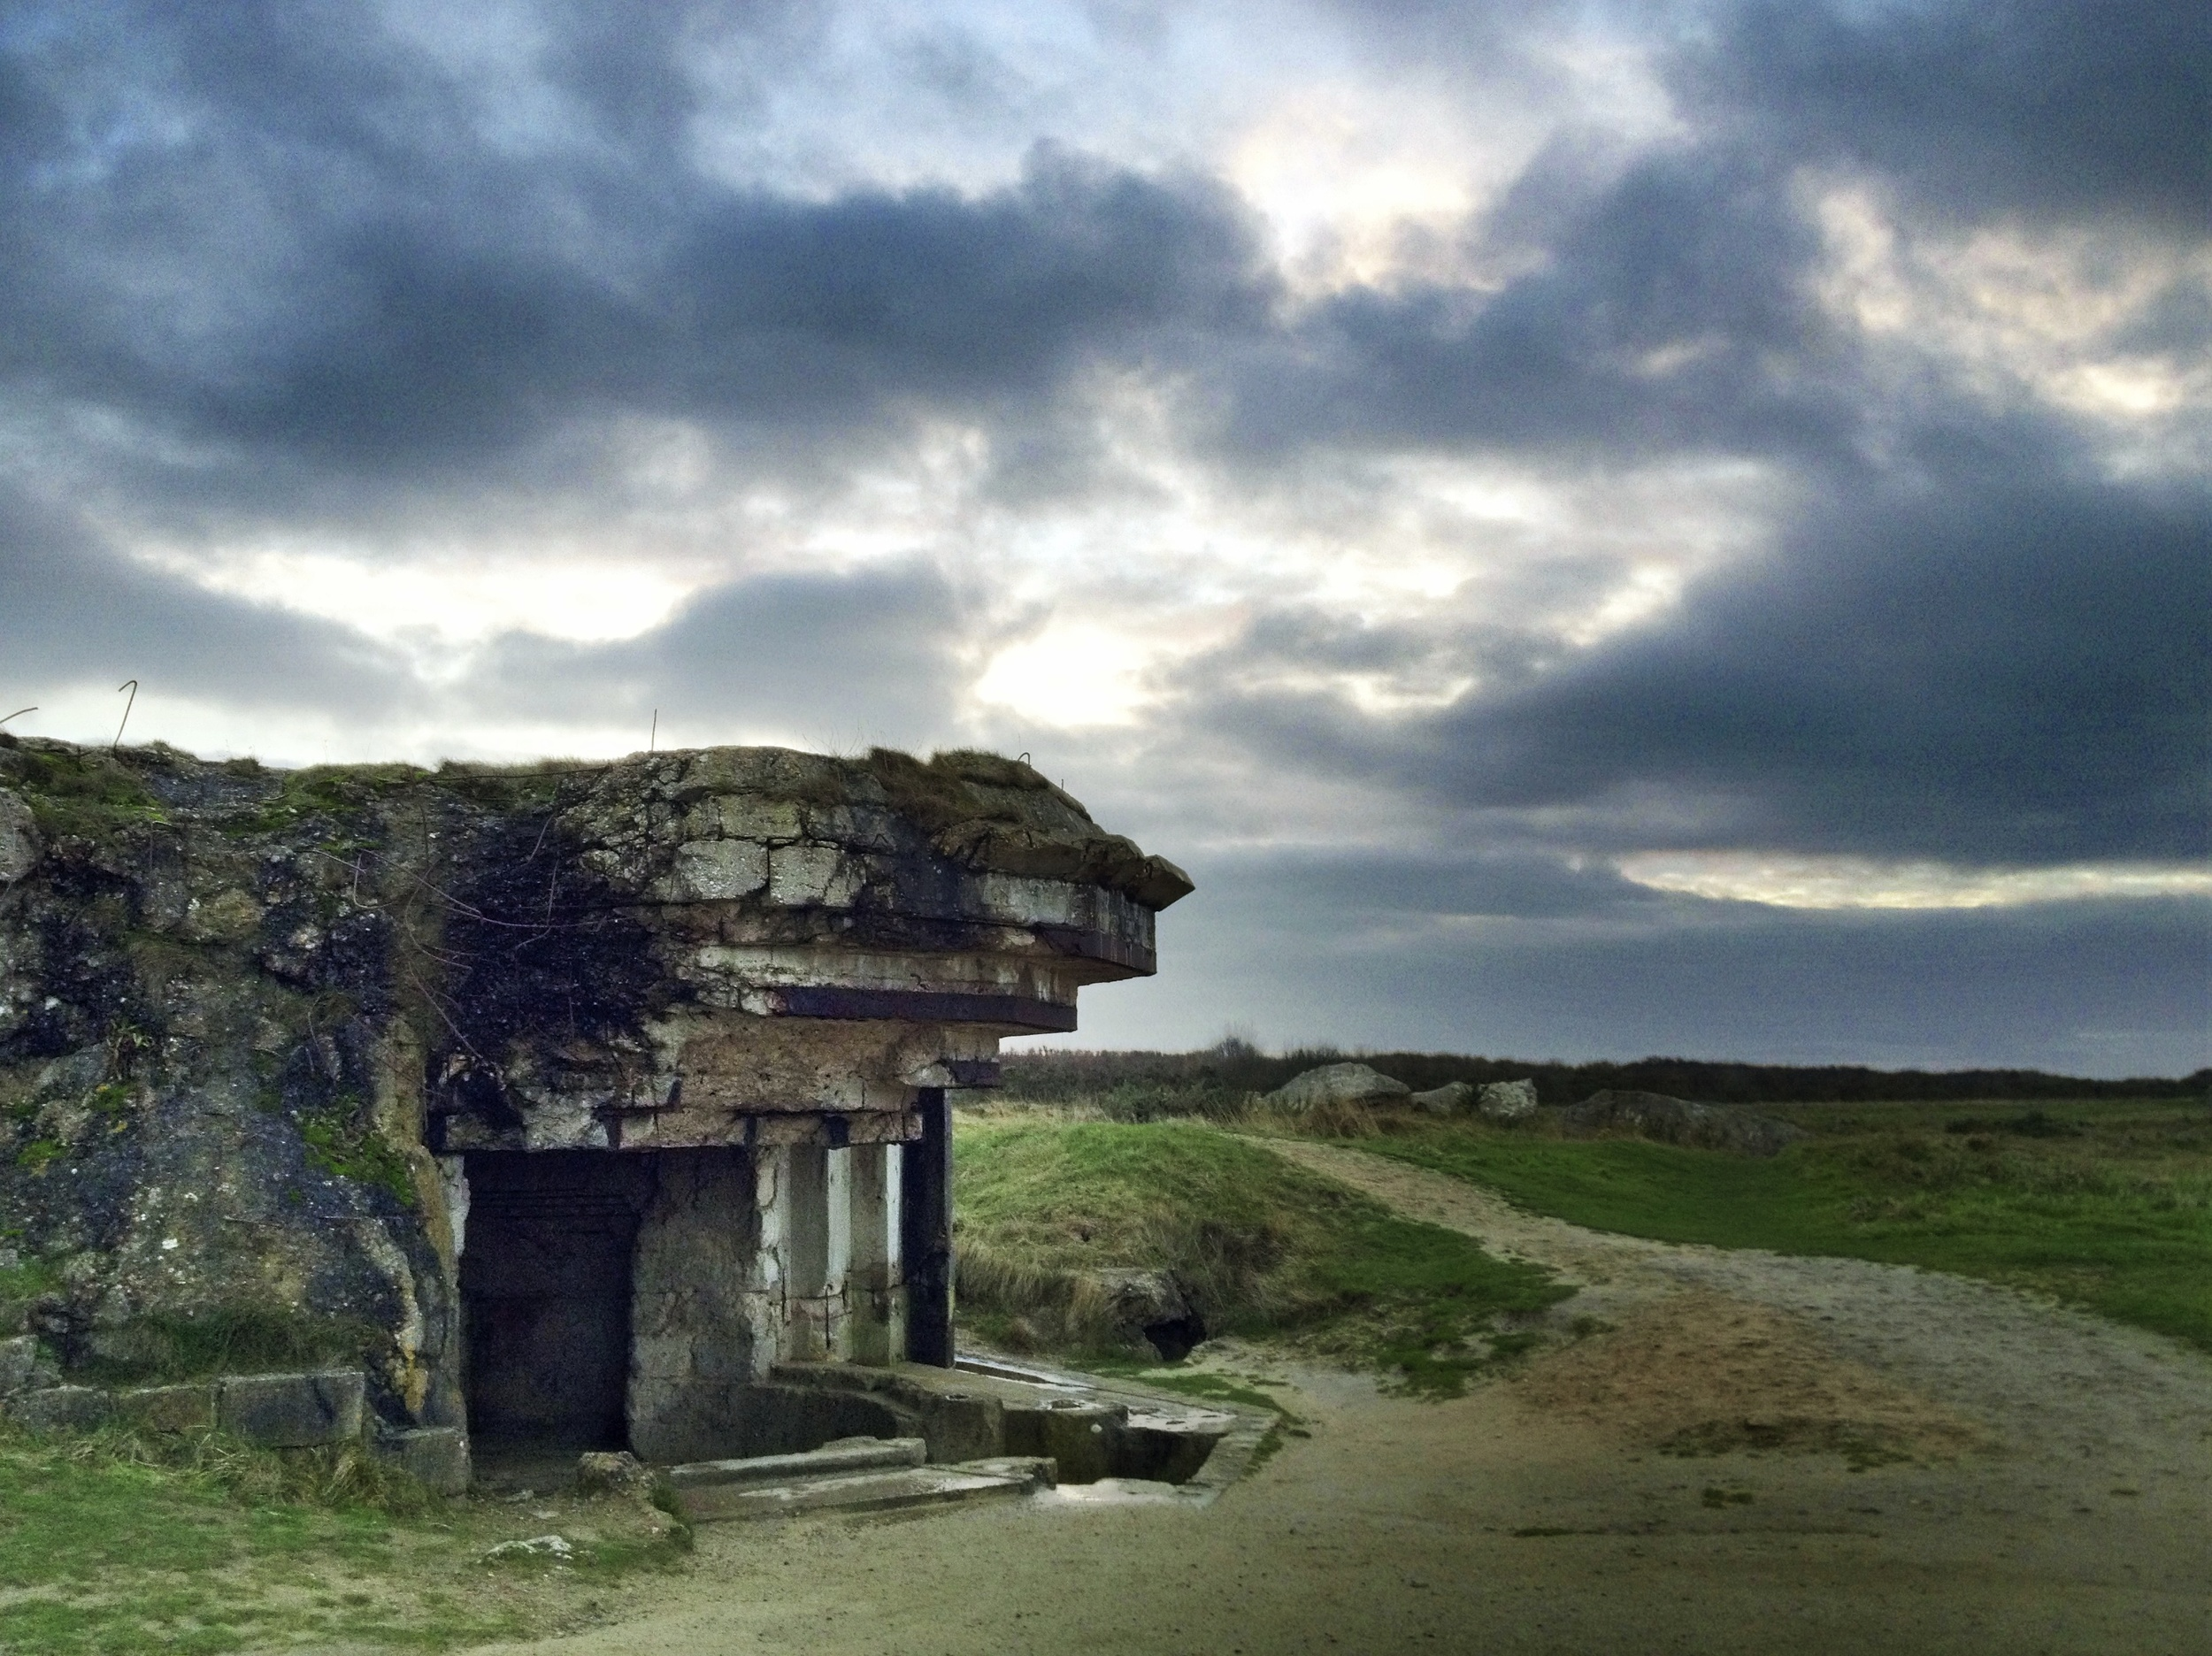 WWII bunker, Point du Hoc